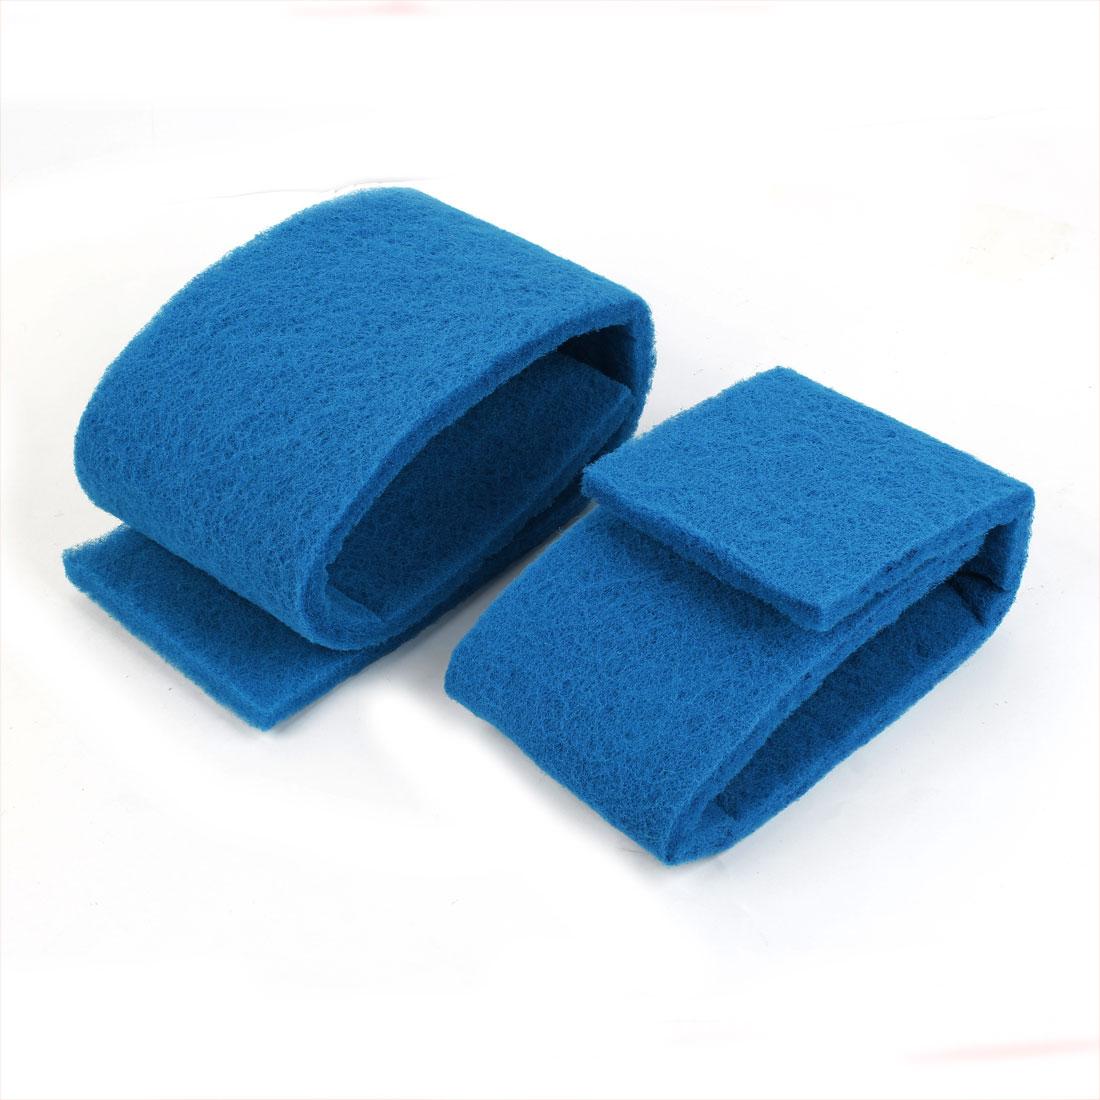 2pcs Blue Rectangle Recycling Biochemical Filter Sponge for Aquarium